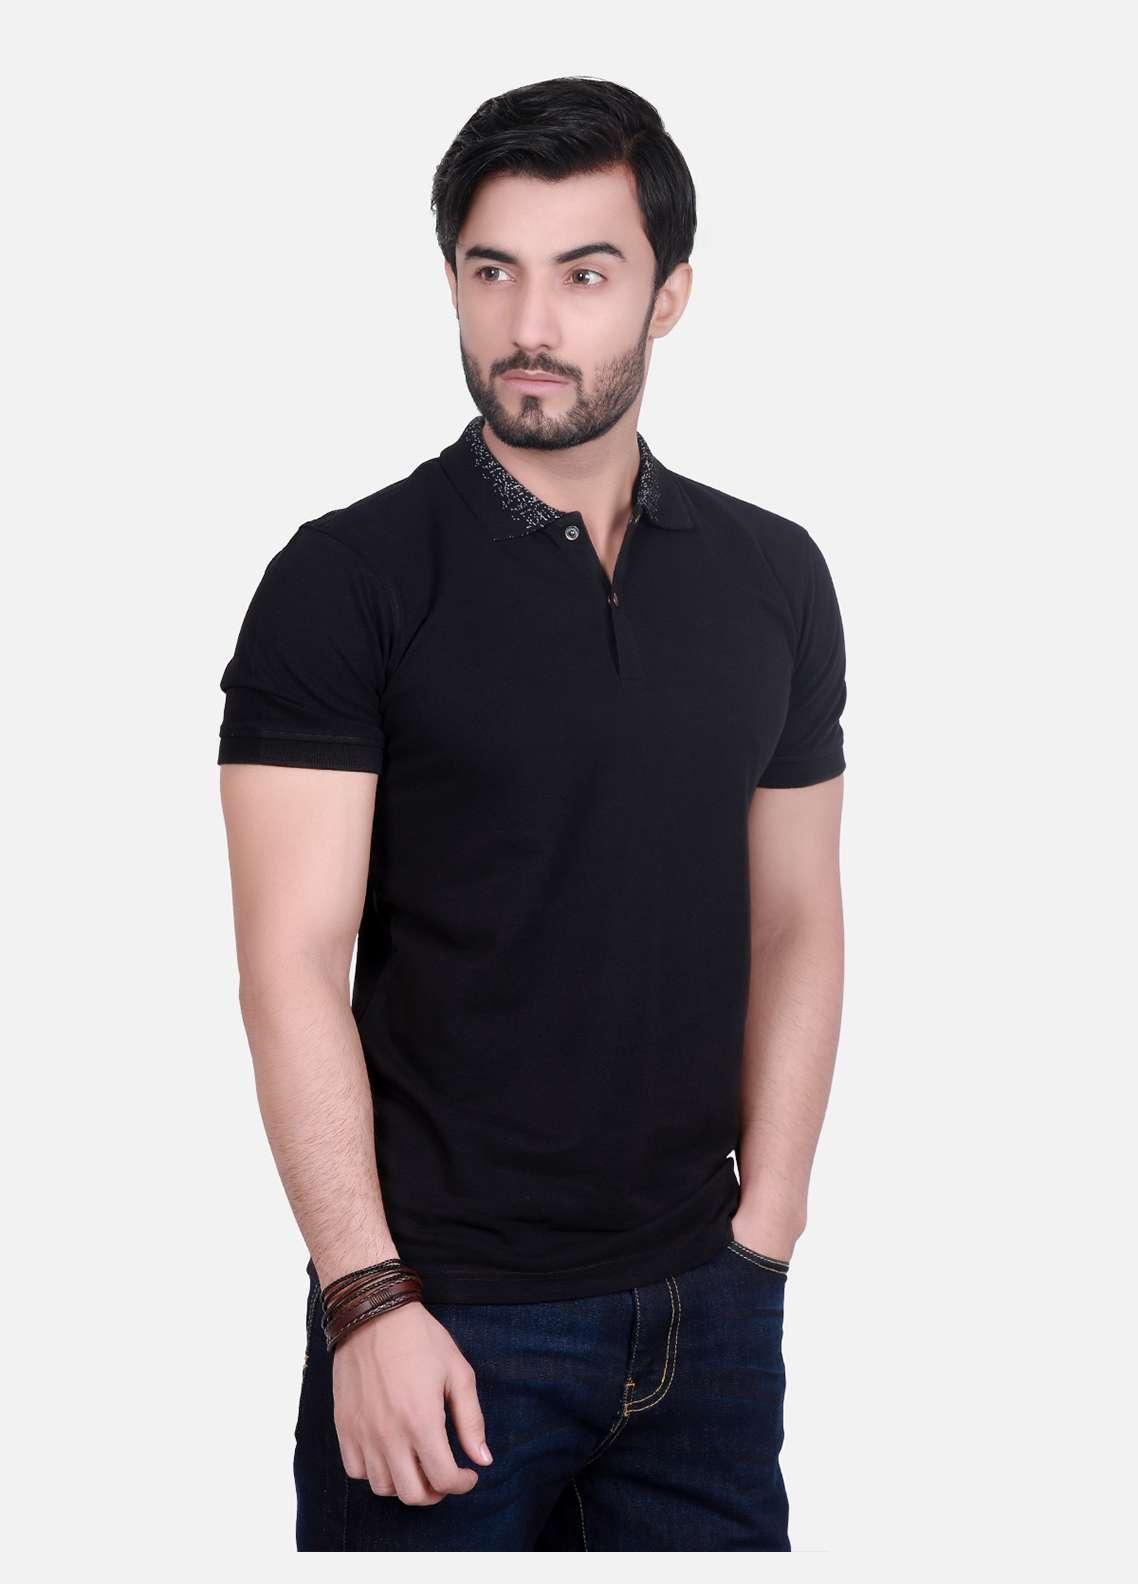 Furor Cotton Polo T-Shirts for Men - Black FRM18PS 018